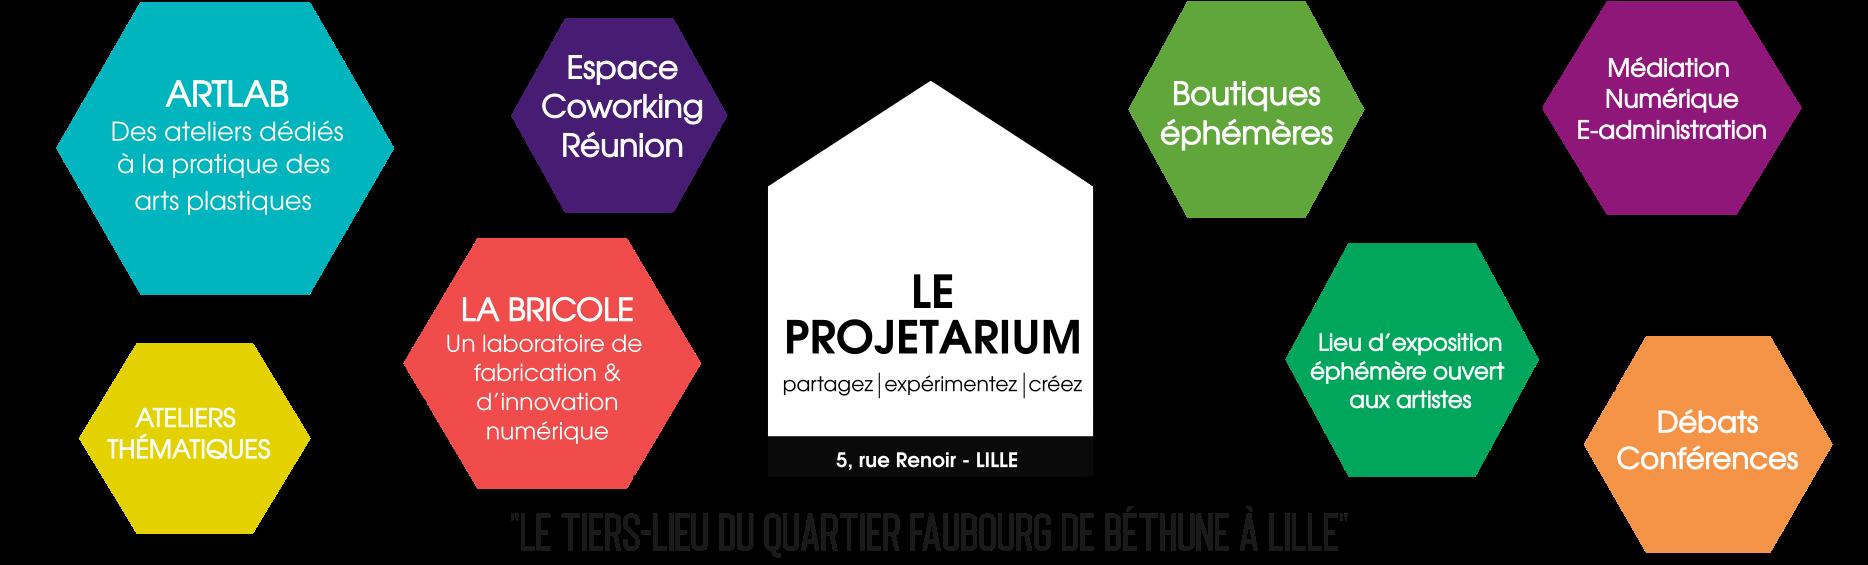 Projetarium